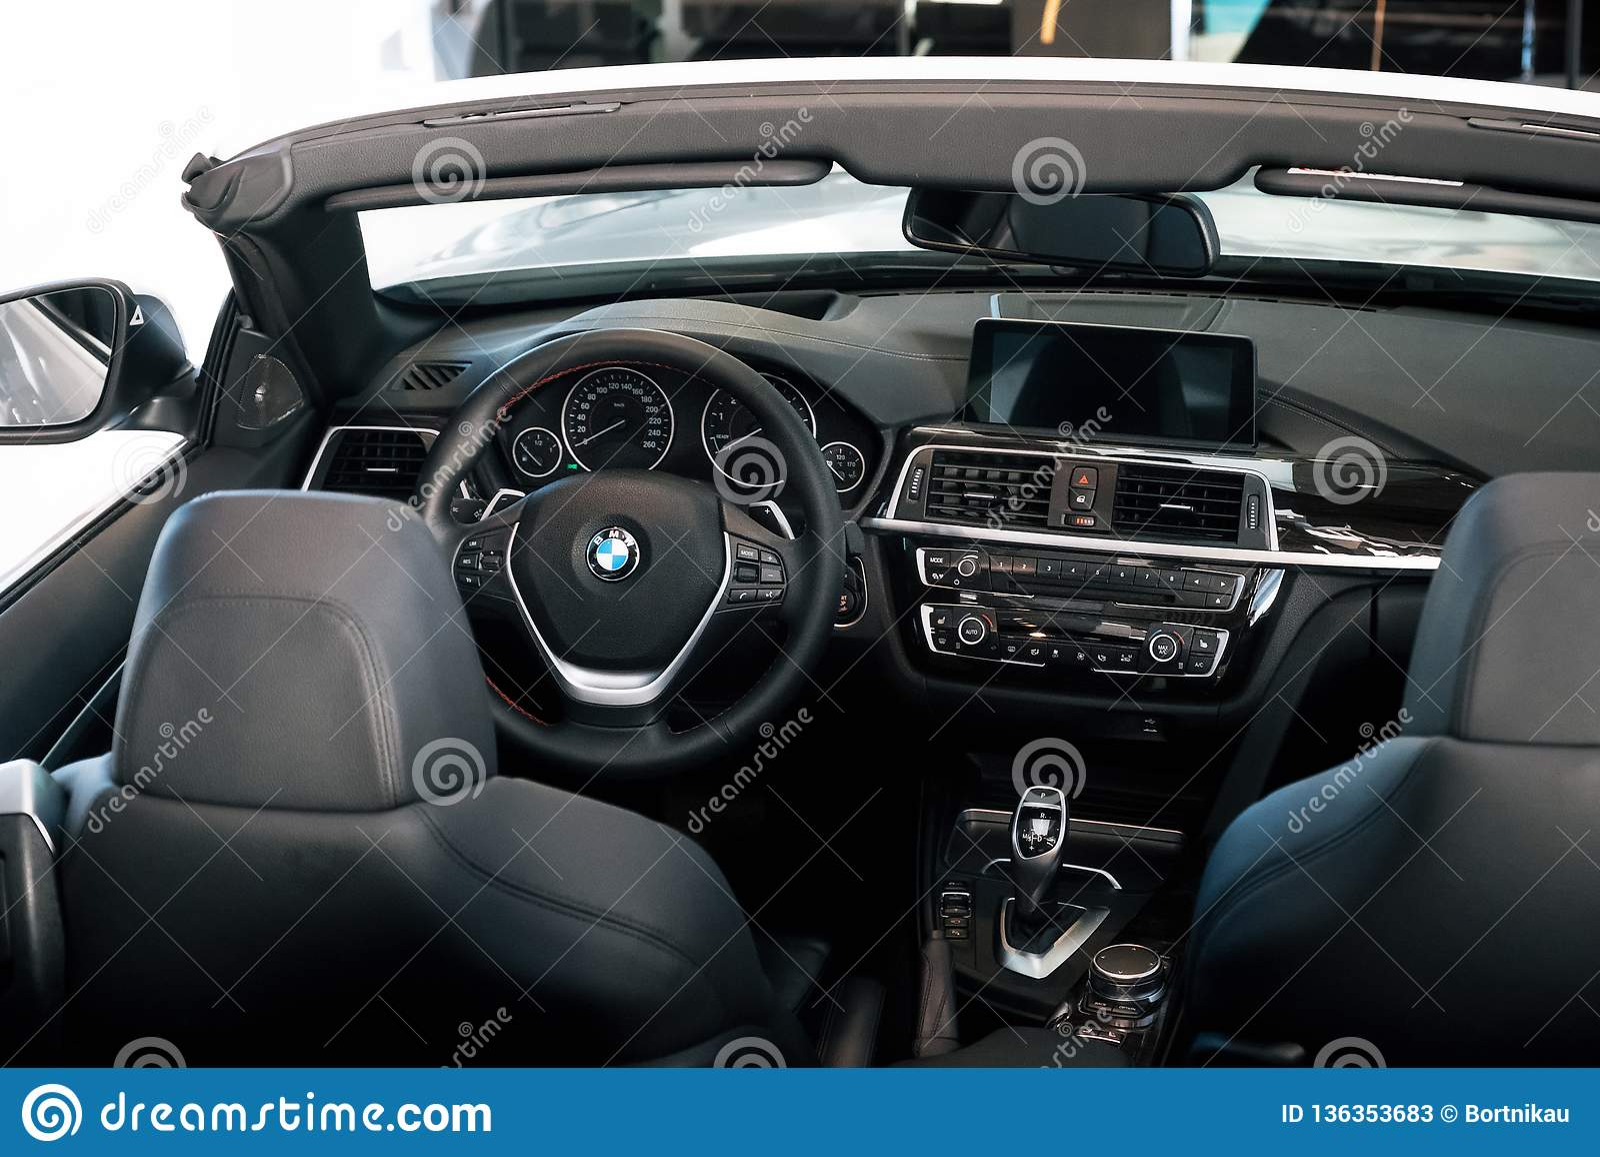 Nterior Of Bmw 430 Cabriolet Sports Car Editorial Stock Photo Image Of Automotive Elegant 136353683